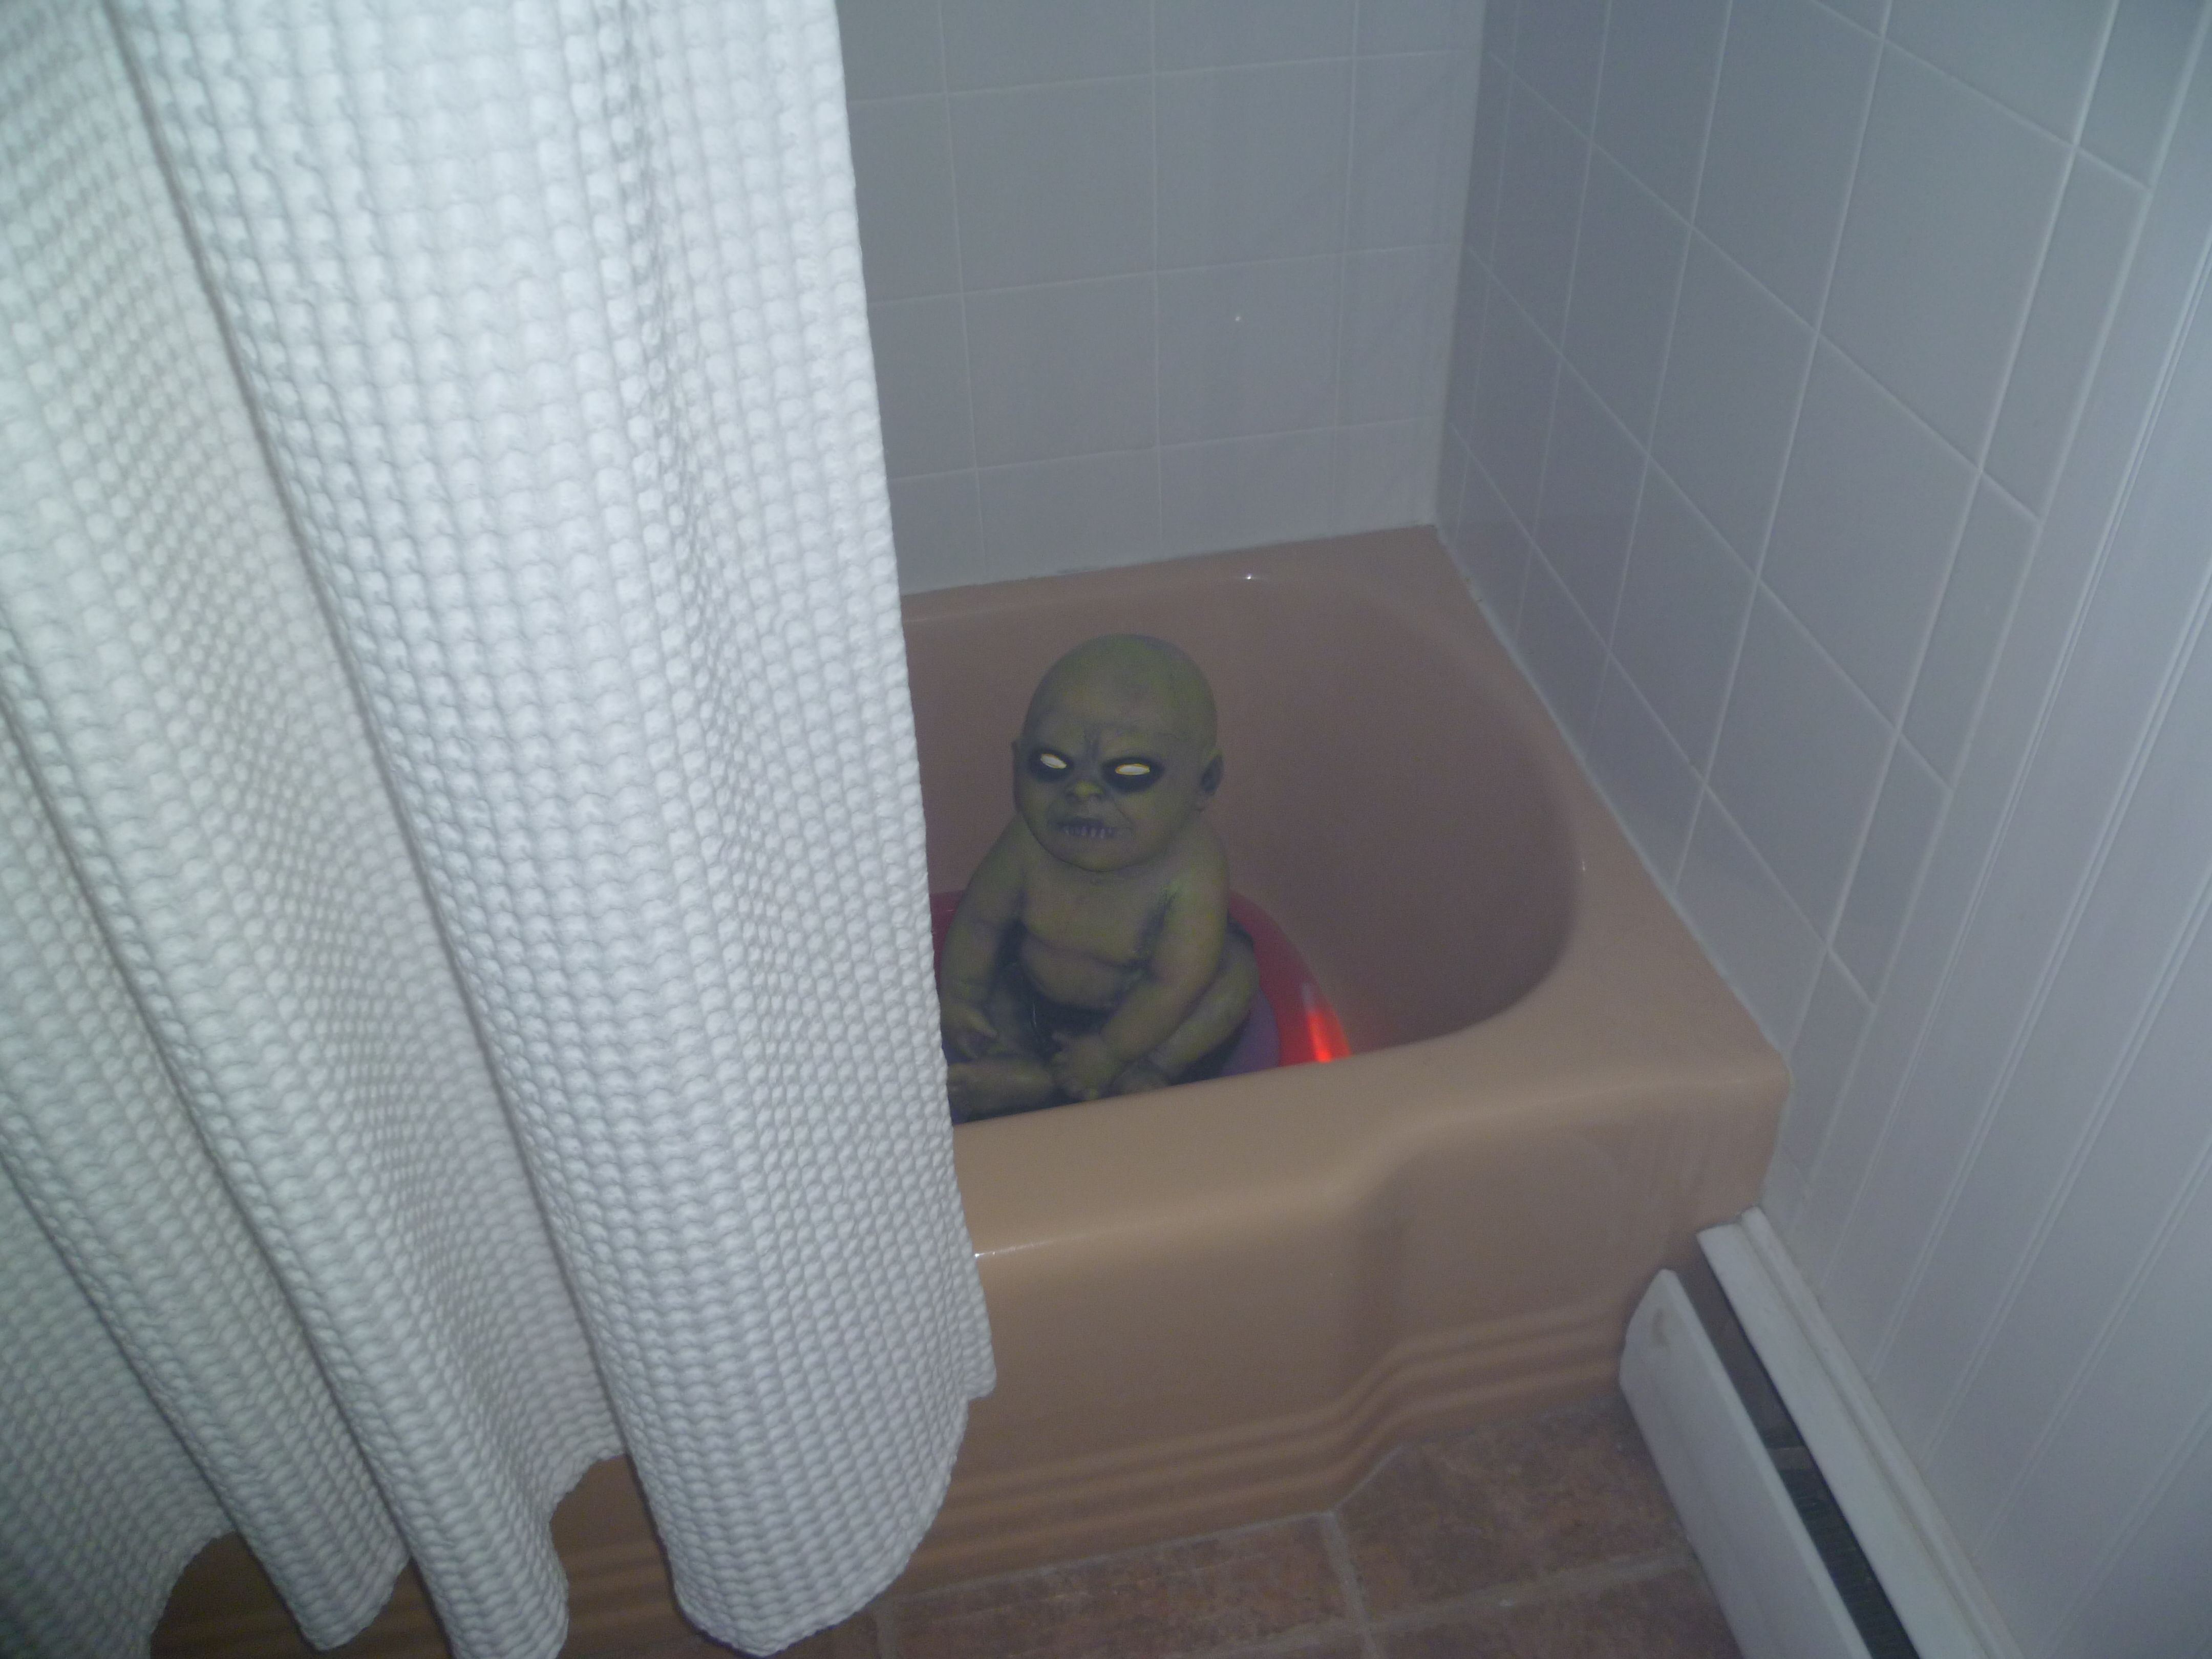 Halloween Bathroom Accessories Halloween Bathroom Decor Sets Https Www Pinterest Com Pin